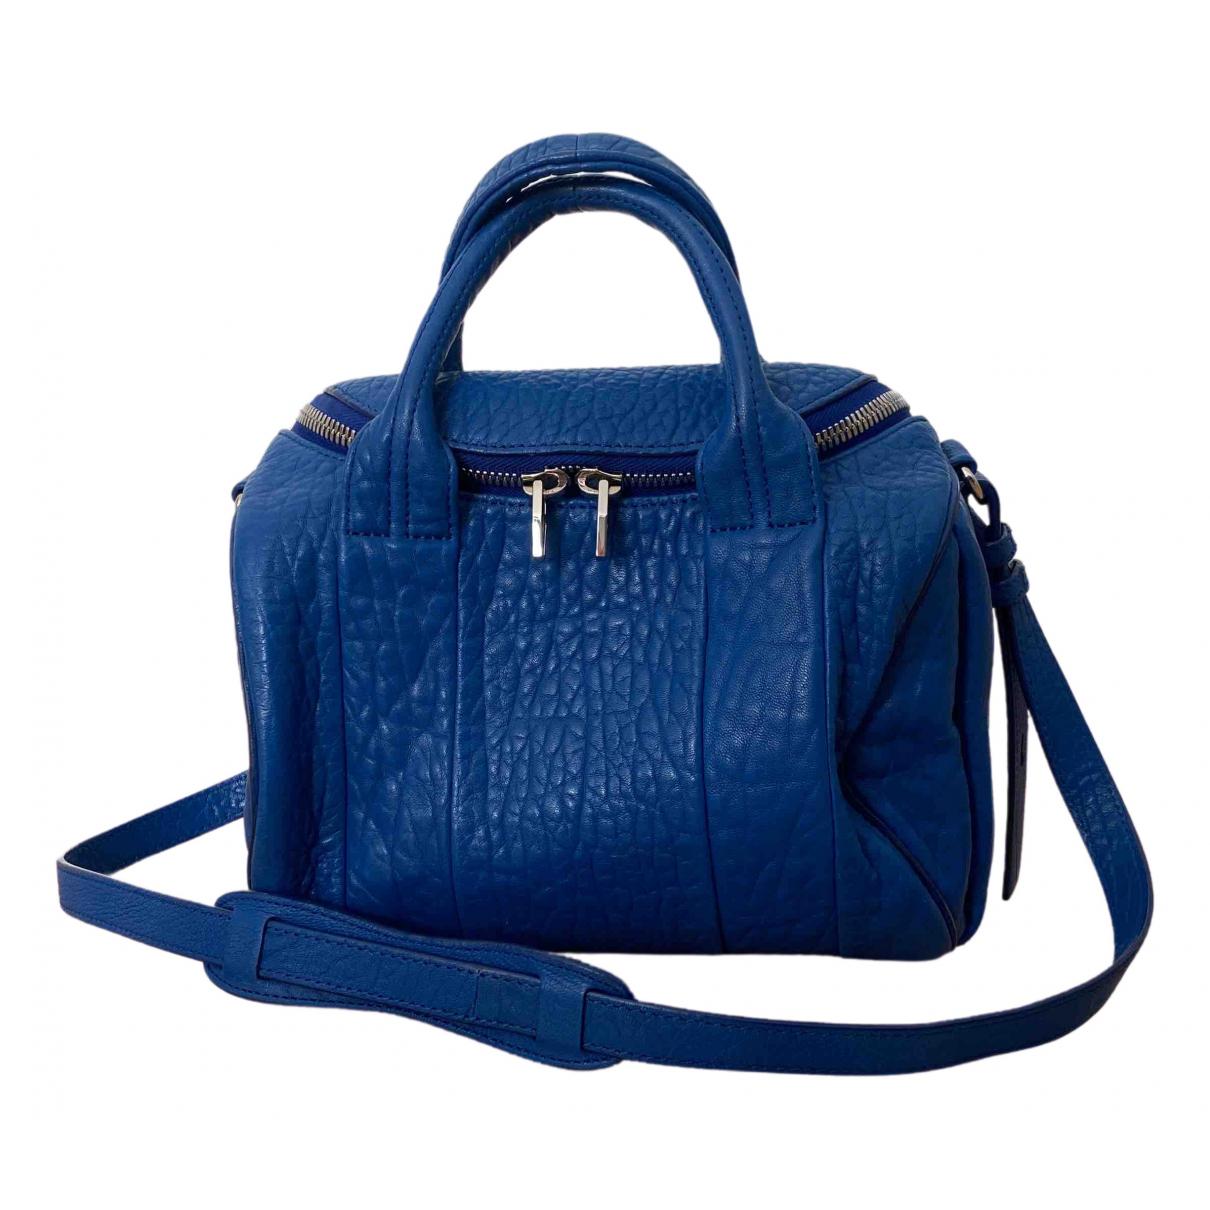 Alexander Wang Rocco Blue Leather handbag for Women \N